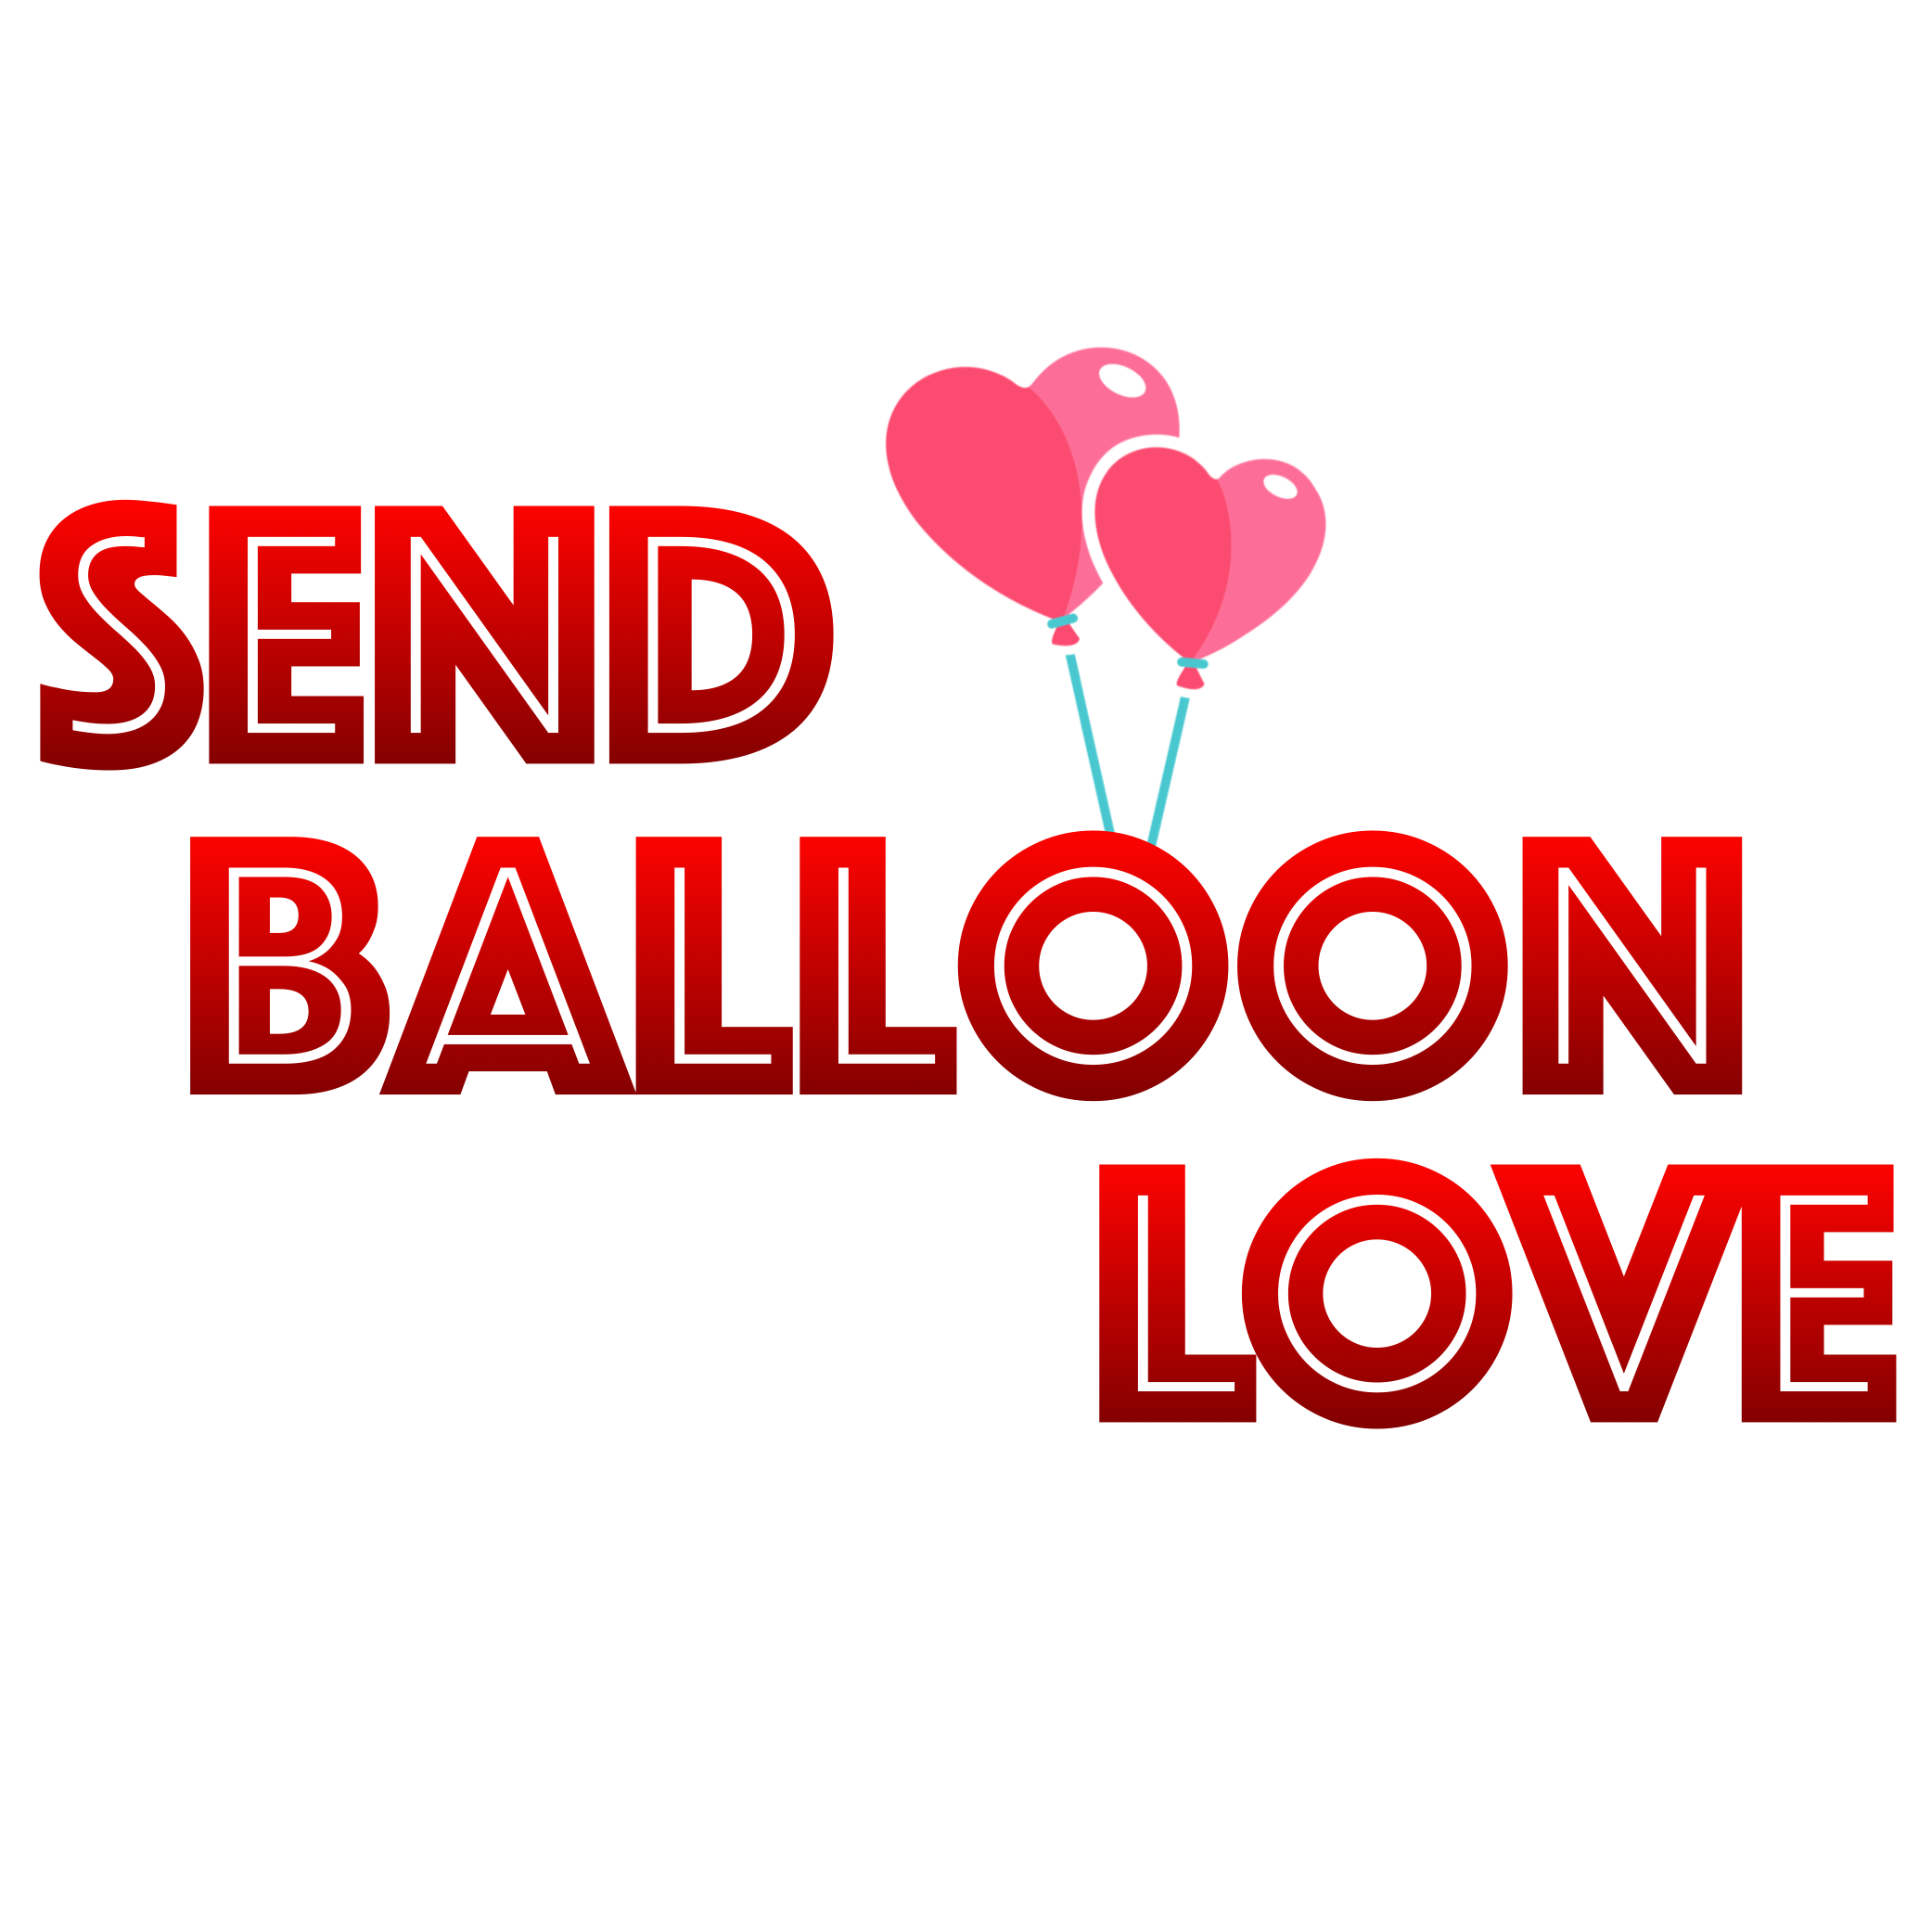 sendballoonlove3.png